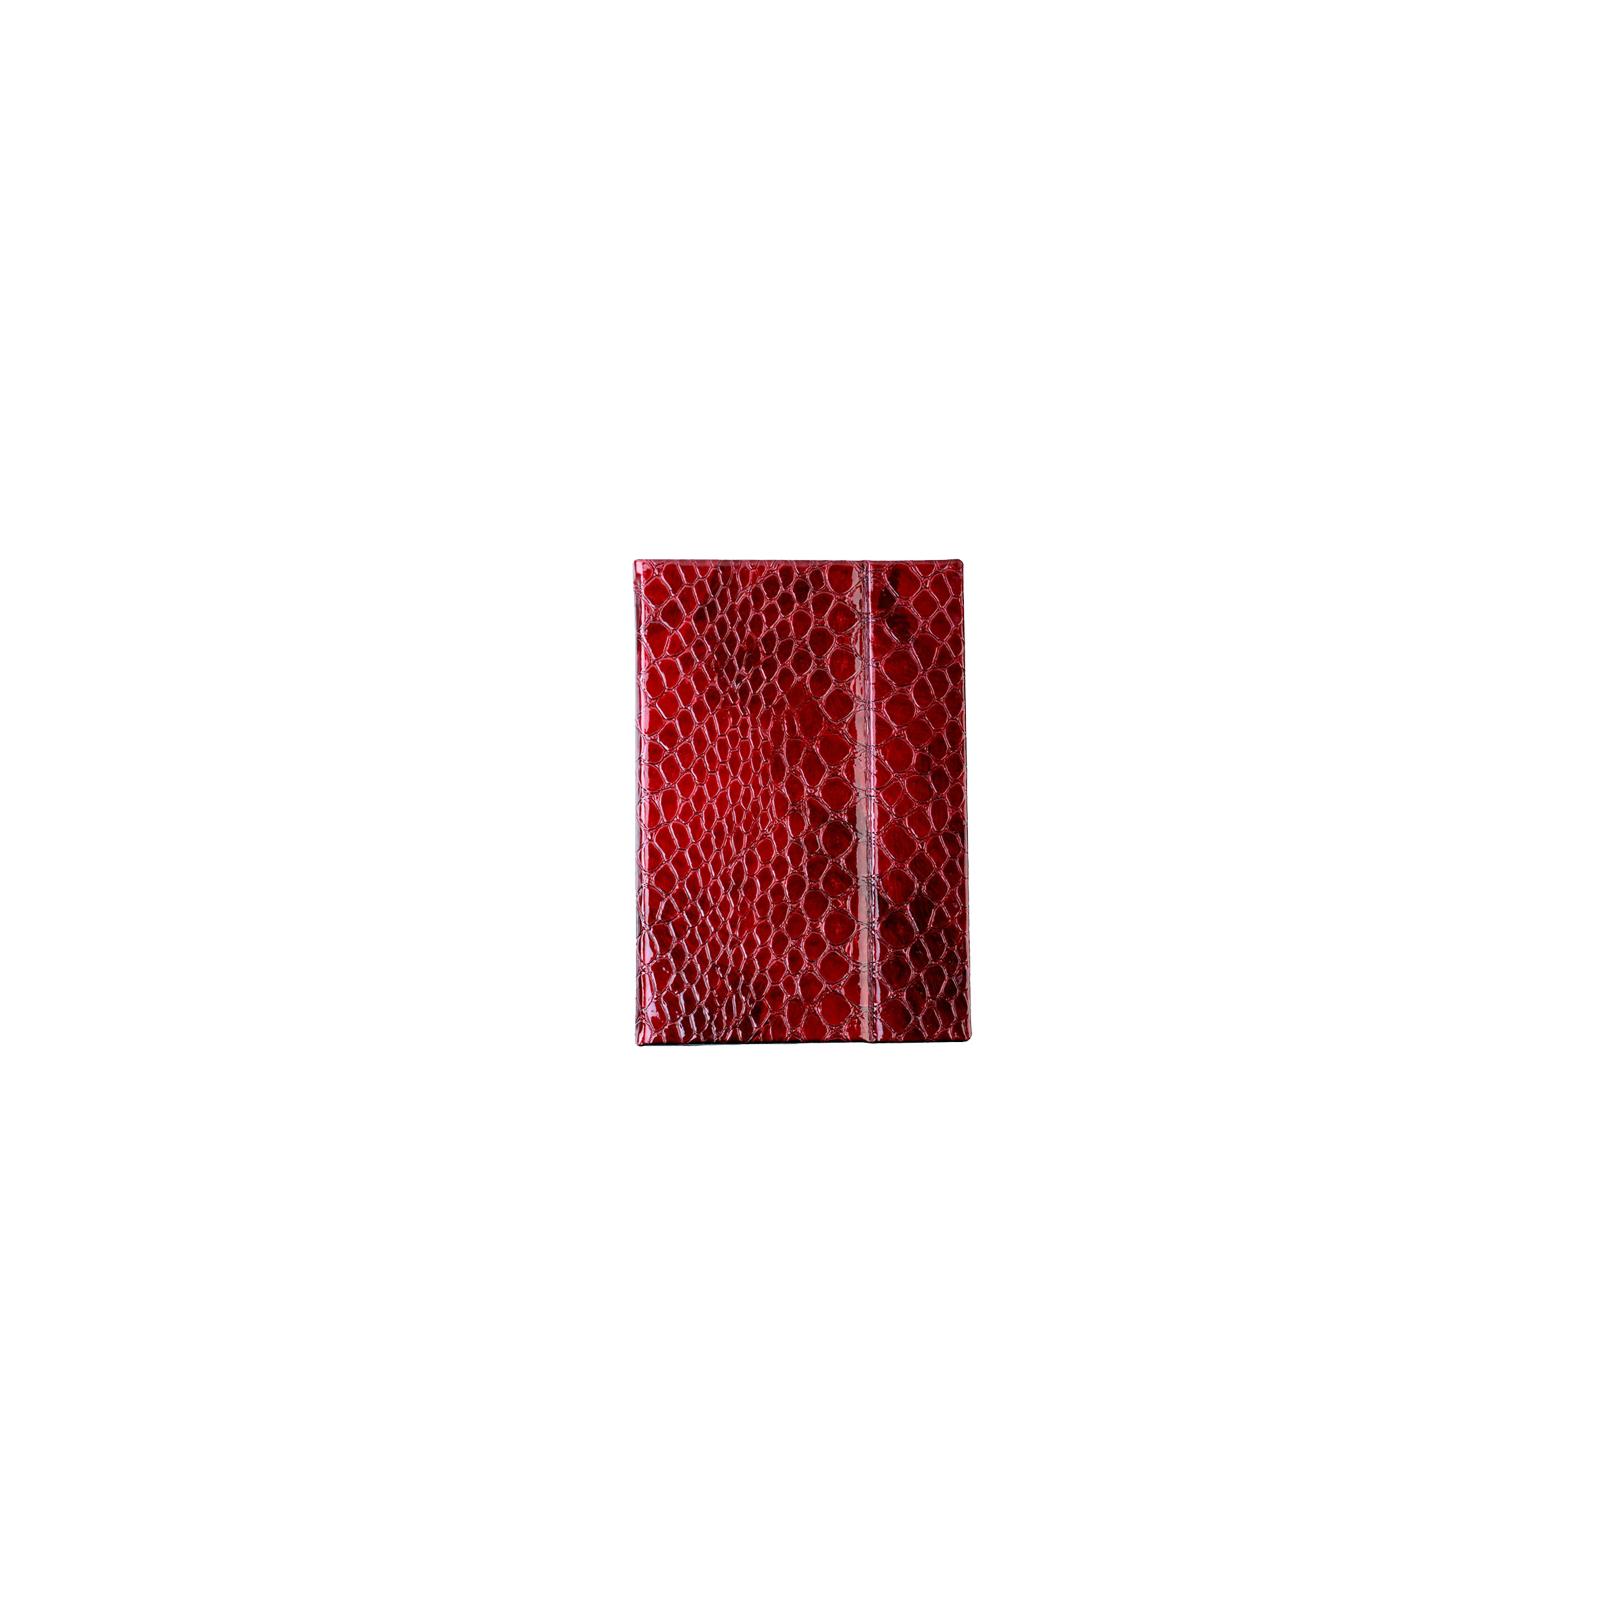 Чехол для планшета Vento 9 Desire glossy - red reptile изображение 2